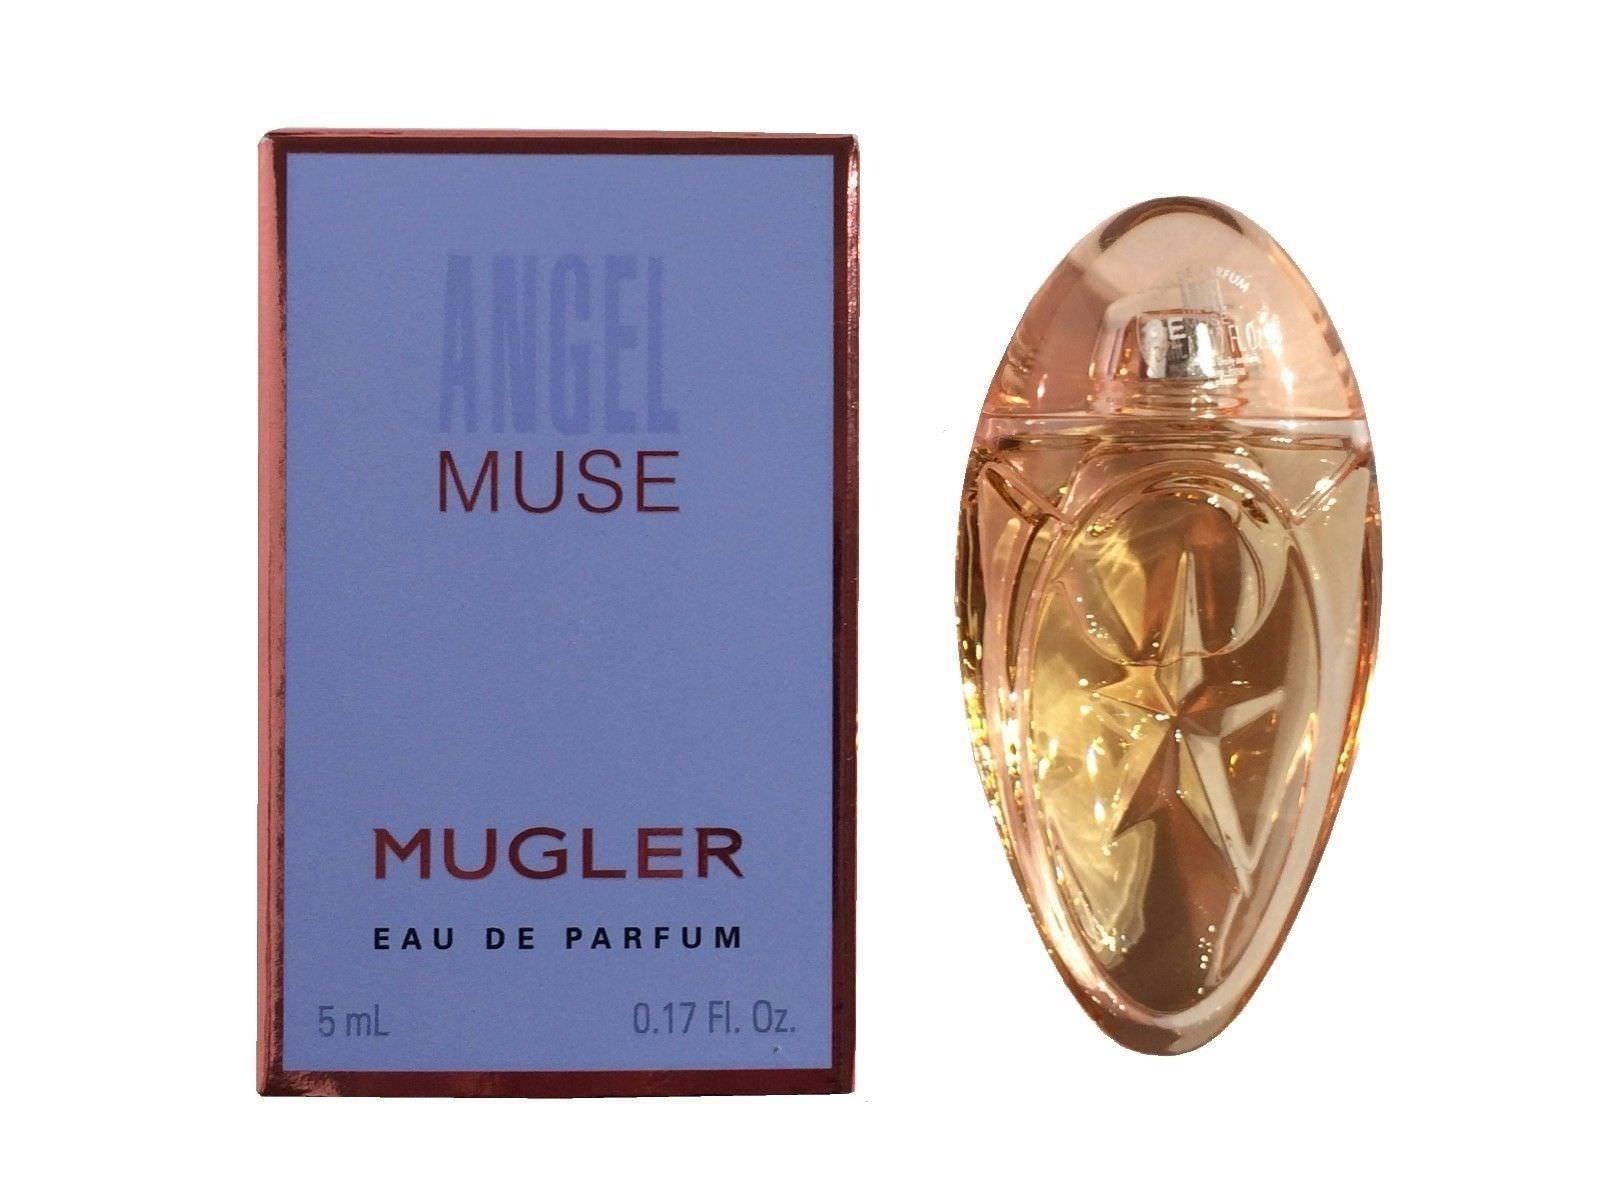 Thierry Mugler Muse Perfume Miniature